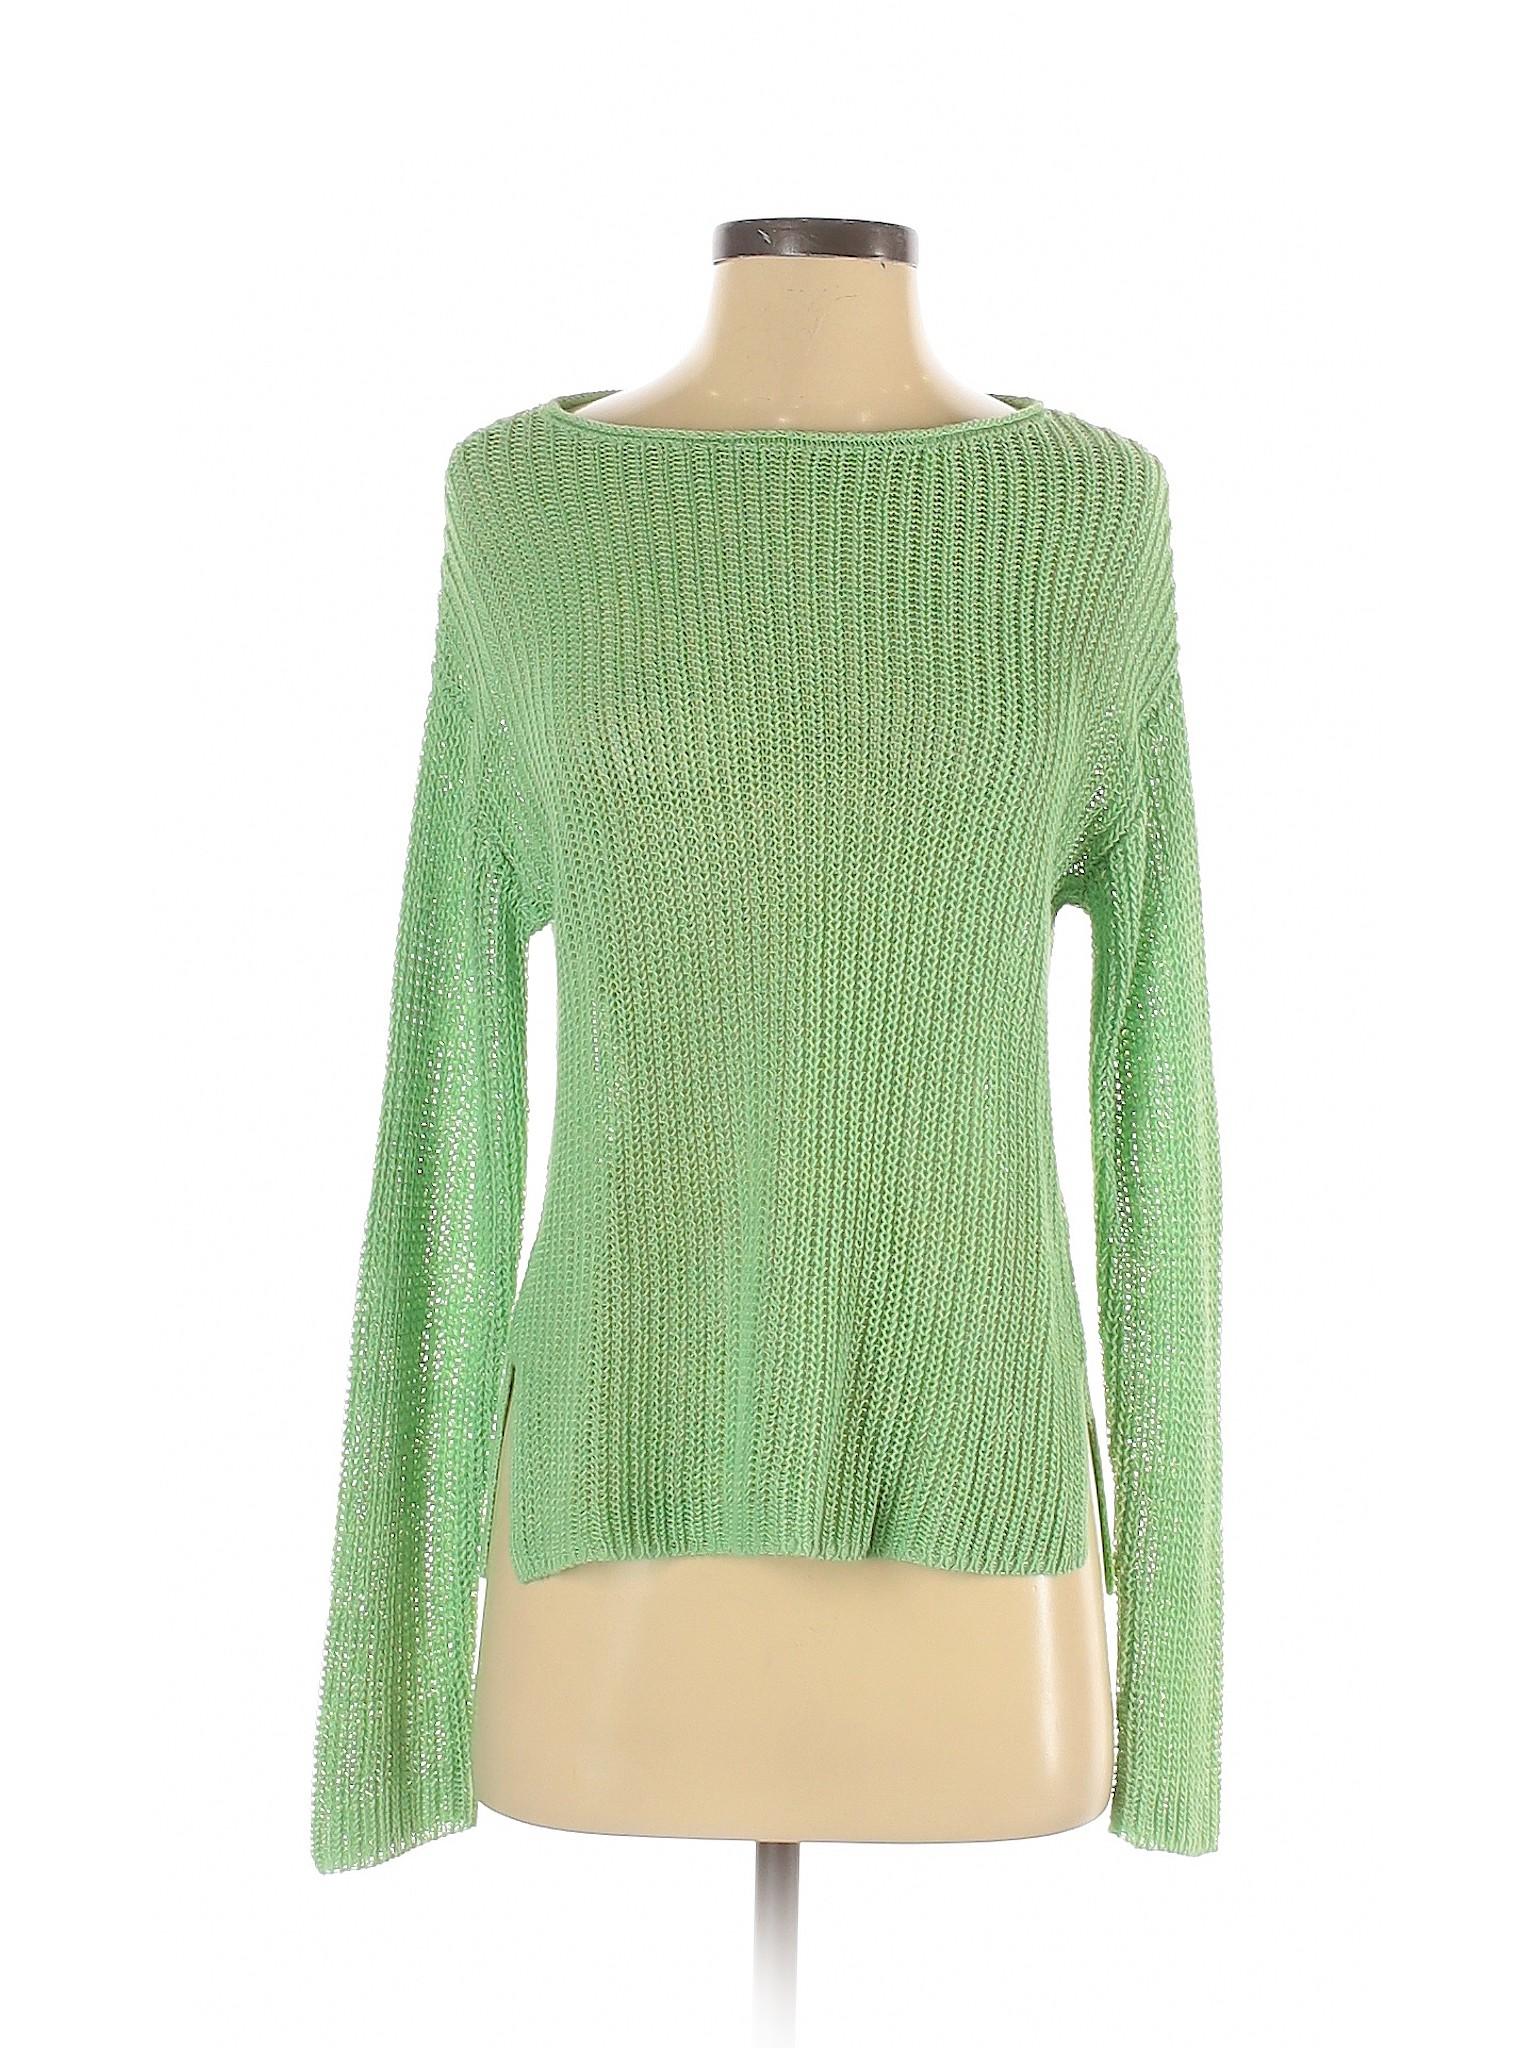 Details about J.jill Women Green Pullover Sweater S